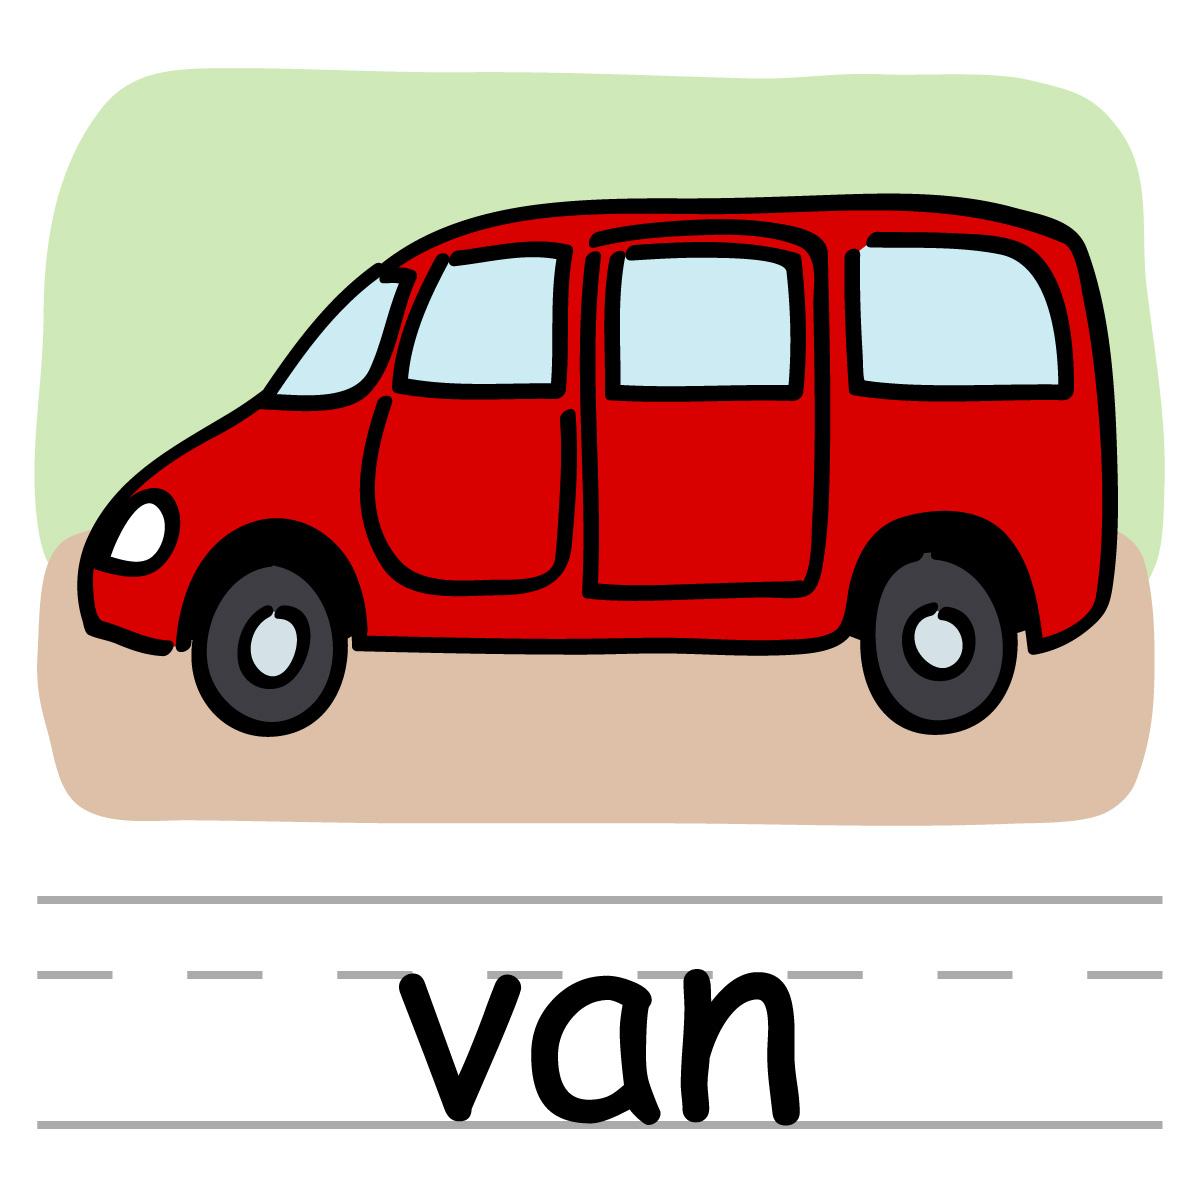 Vans clipart Clip Free Van Van Clipart